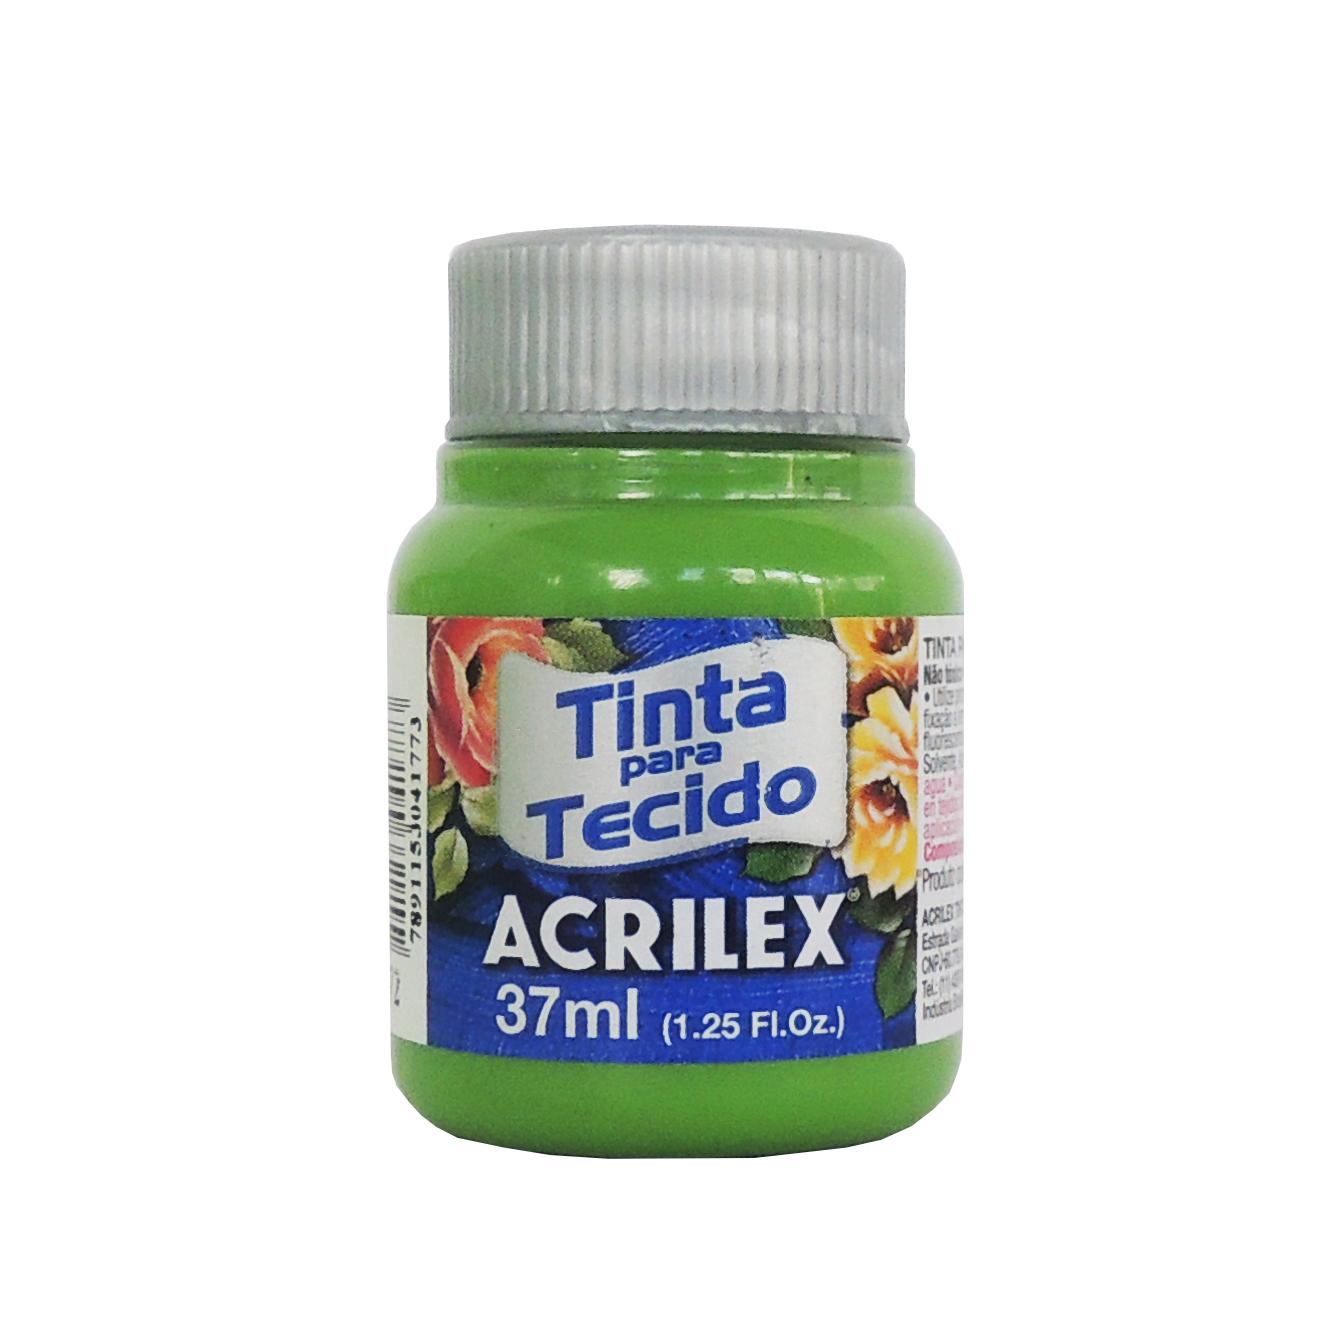 tinta-para-tecido-acrilex-37ml-572-verde-abacate